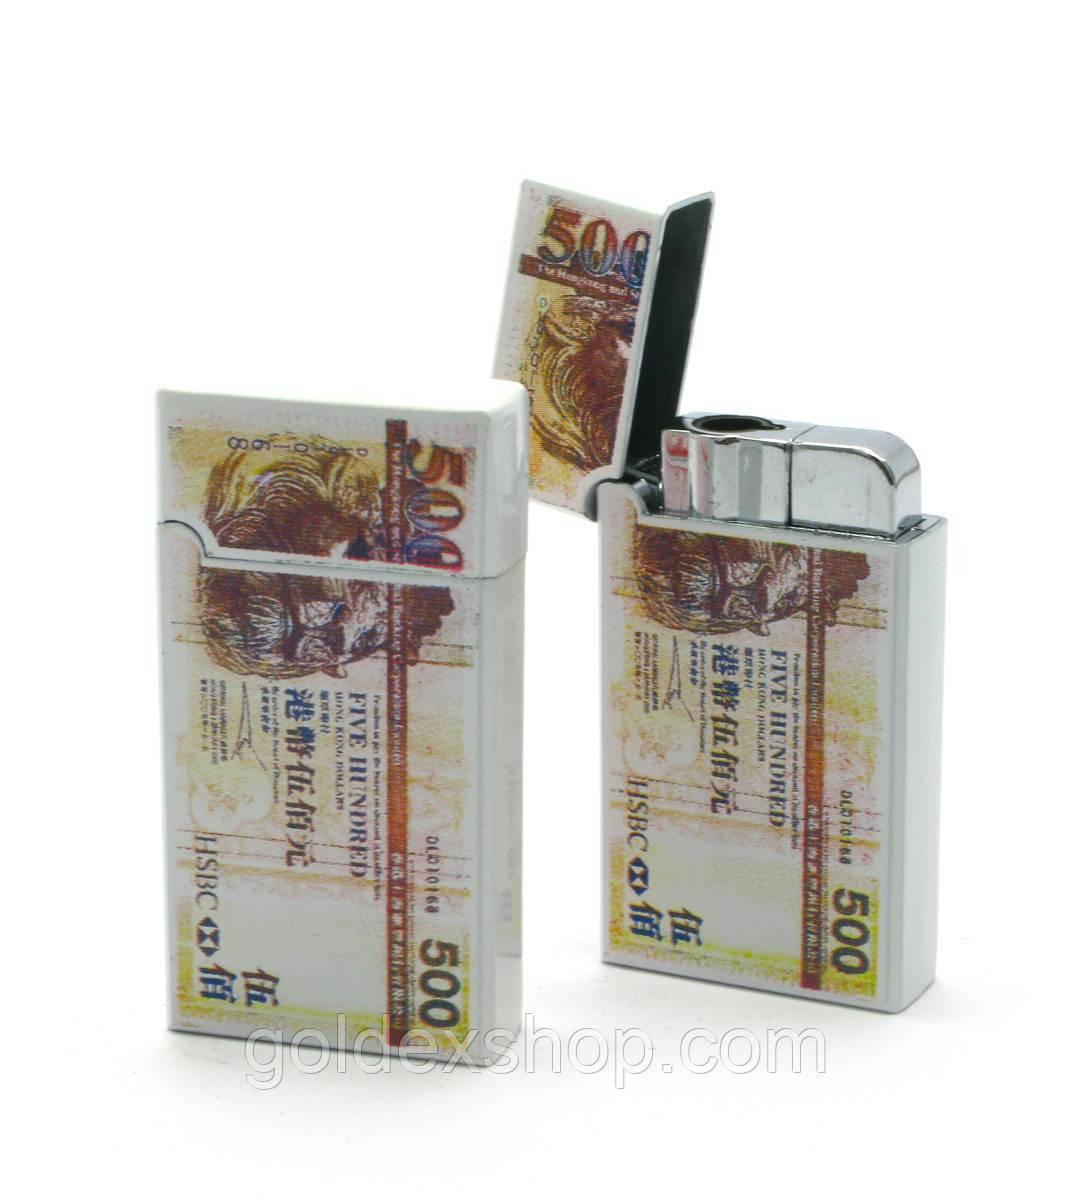 Зажигалка газовая турбо (6,5х3,5х1 см)